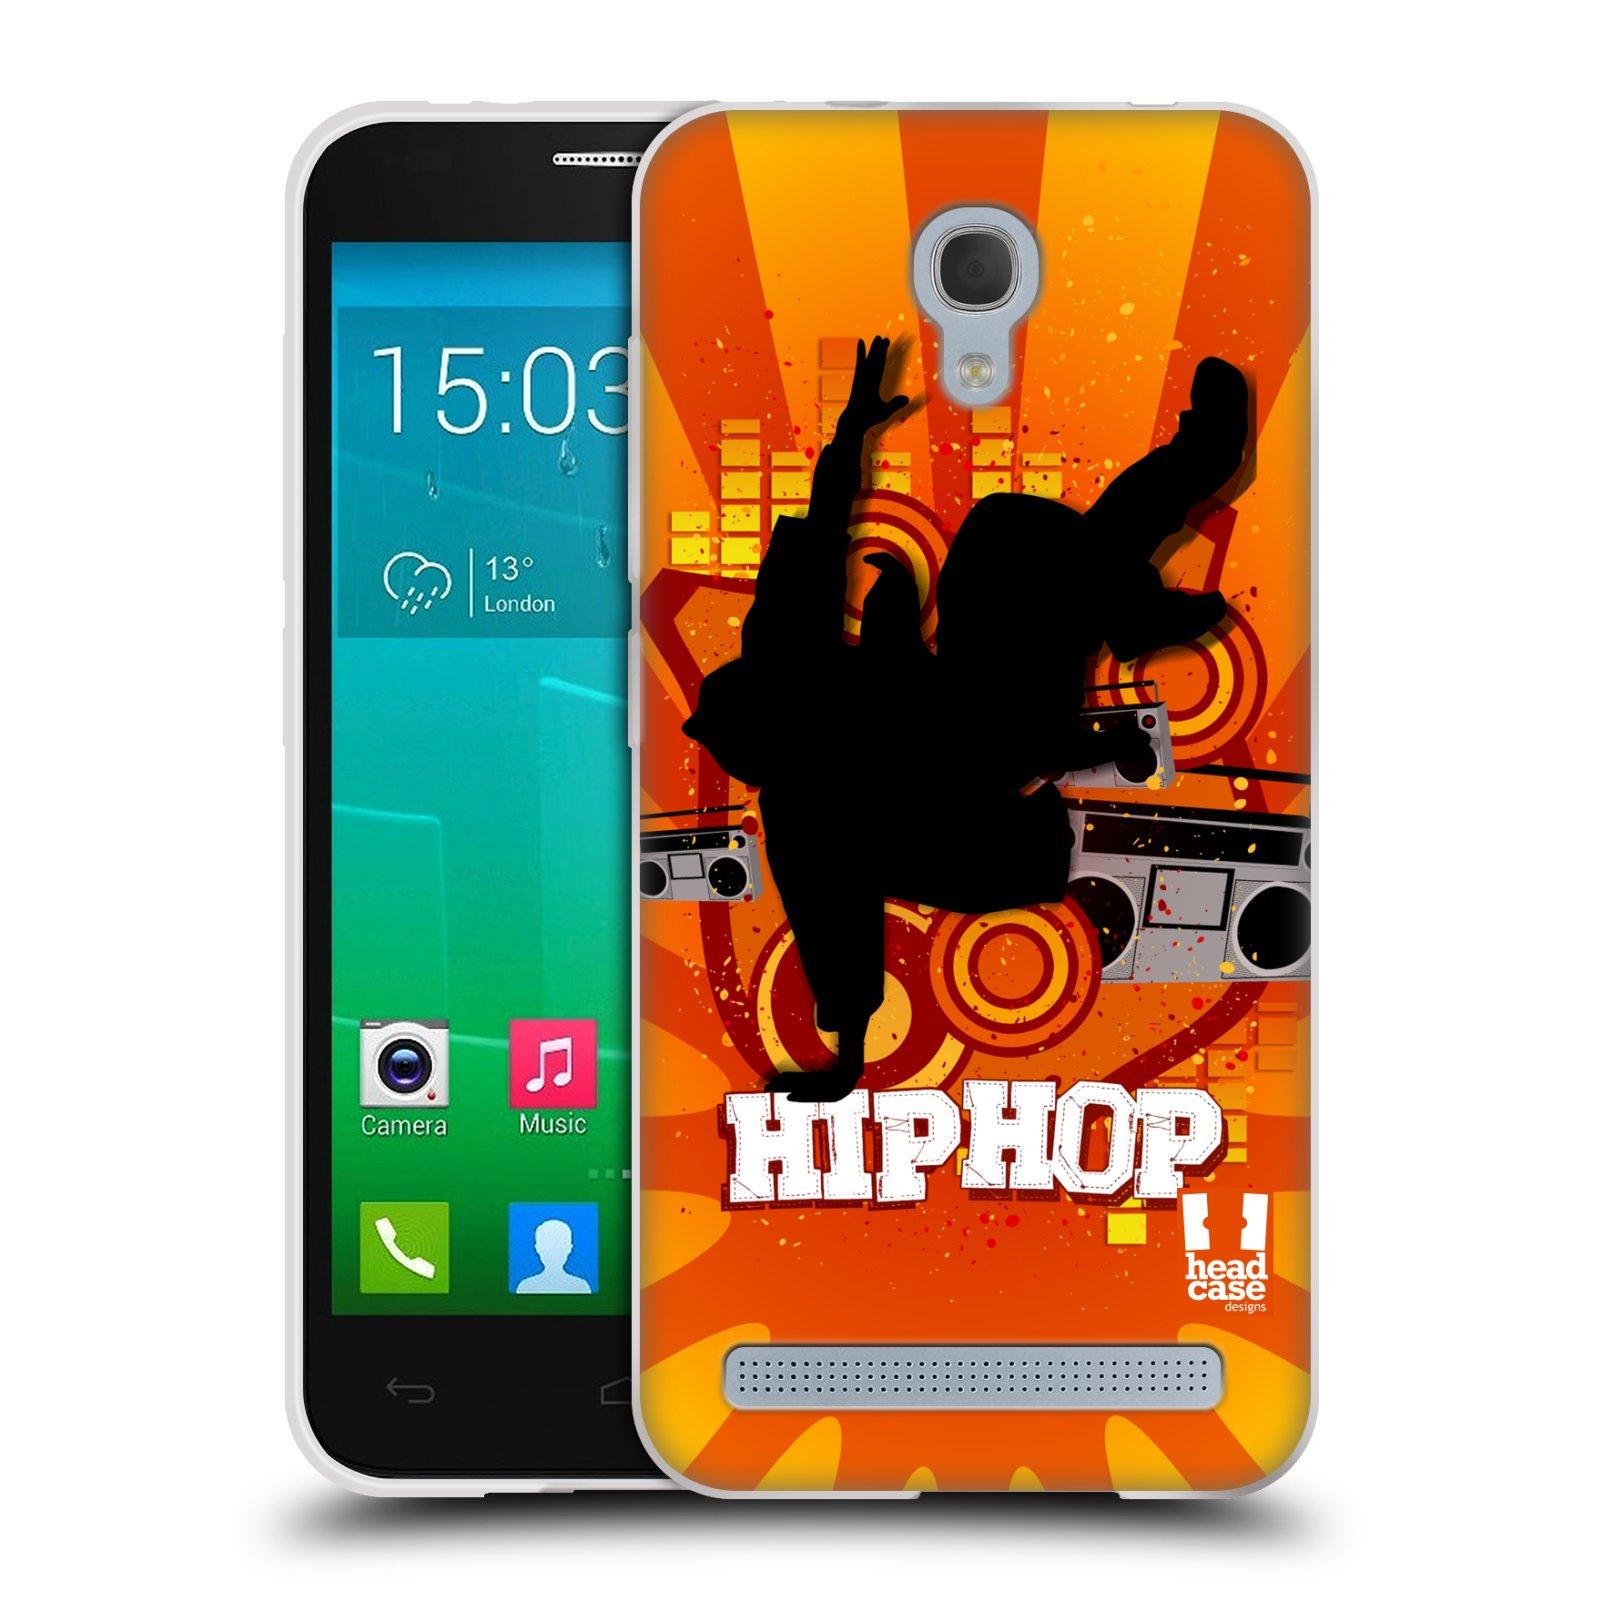 HEAD CASE silikonový obal na mobil Alcatel Idol 2 MINI S 6036Y vzor TANEC SILUETA HIP HOP